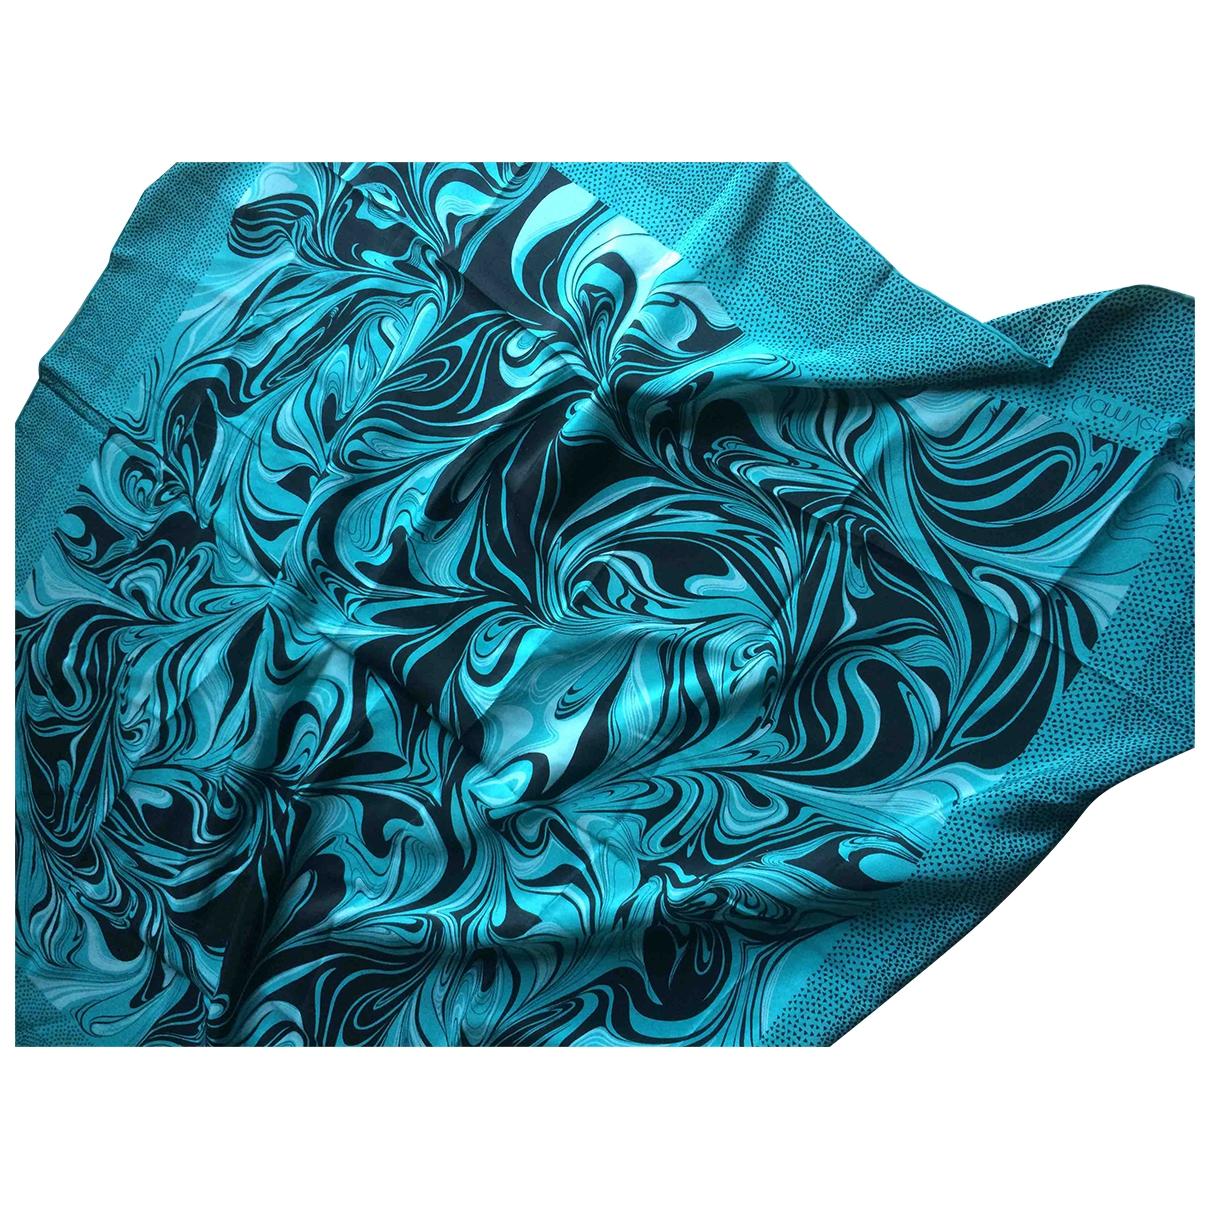 Gianni Versace \N Green Silk scarf for Women \N